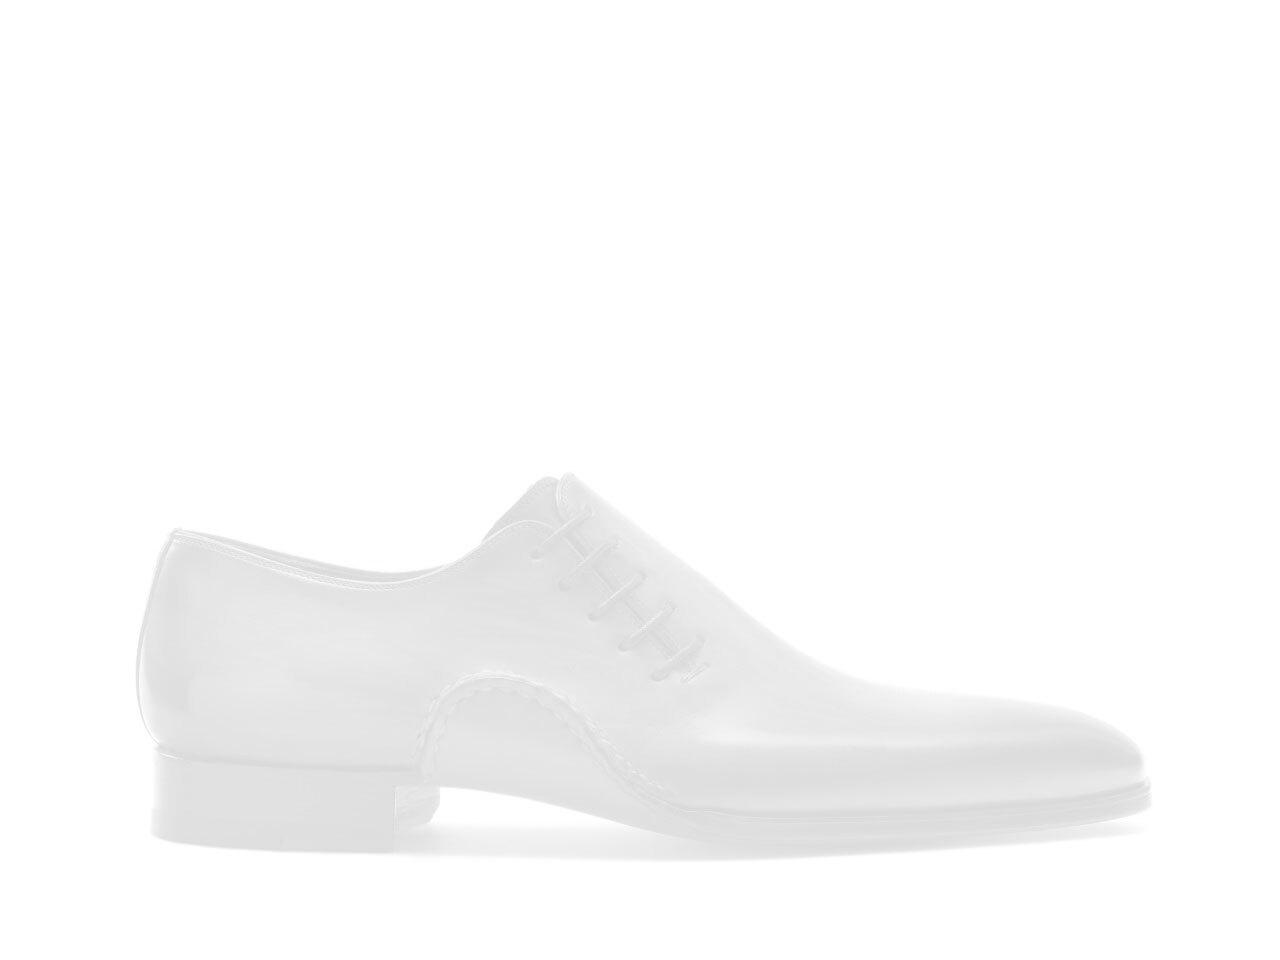 Pair of the Magnanni Segura Midbrown Men's Oxford Shoes